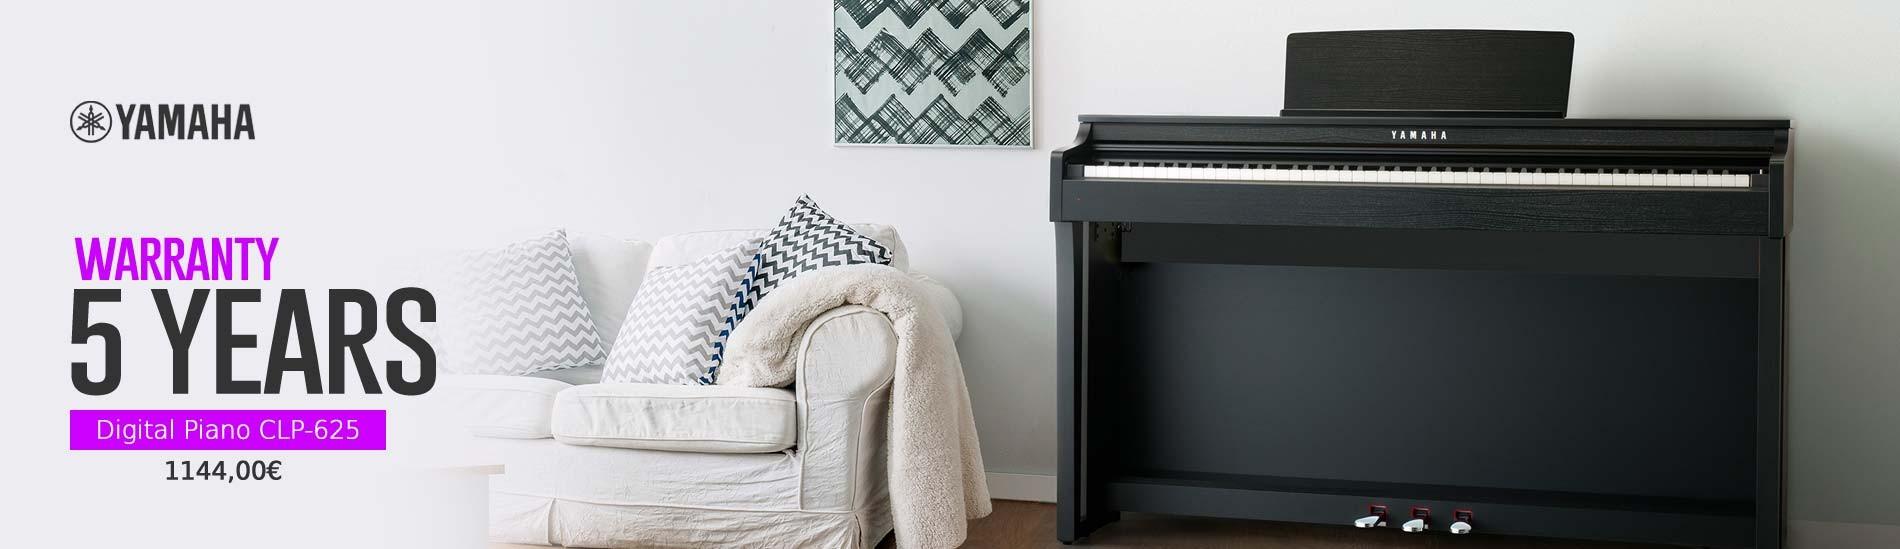 5 Years Warranty Digital Piano CLP-625